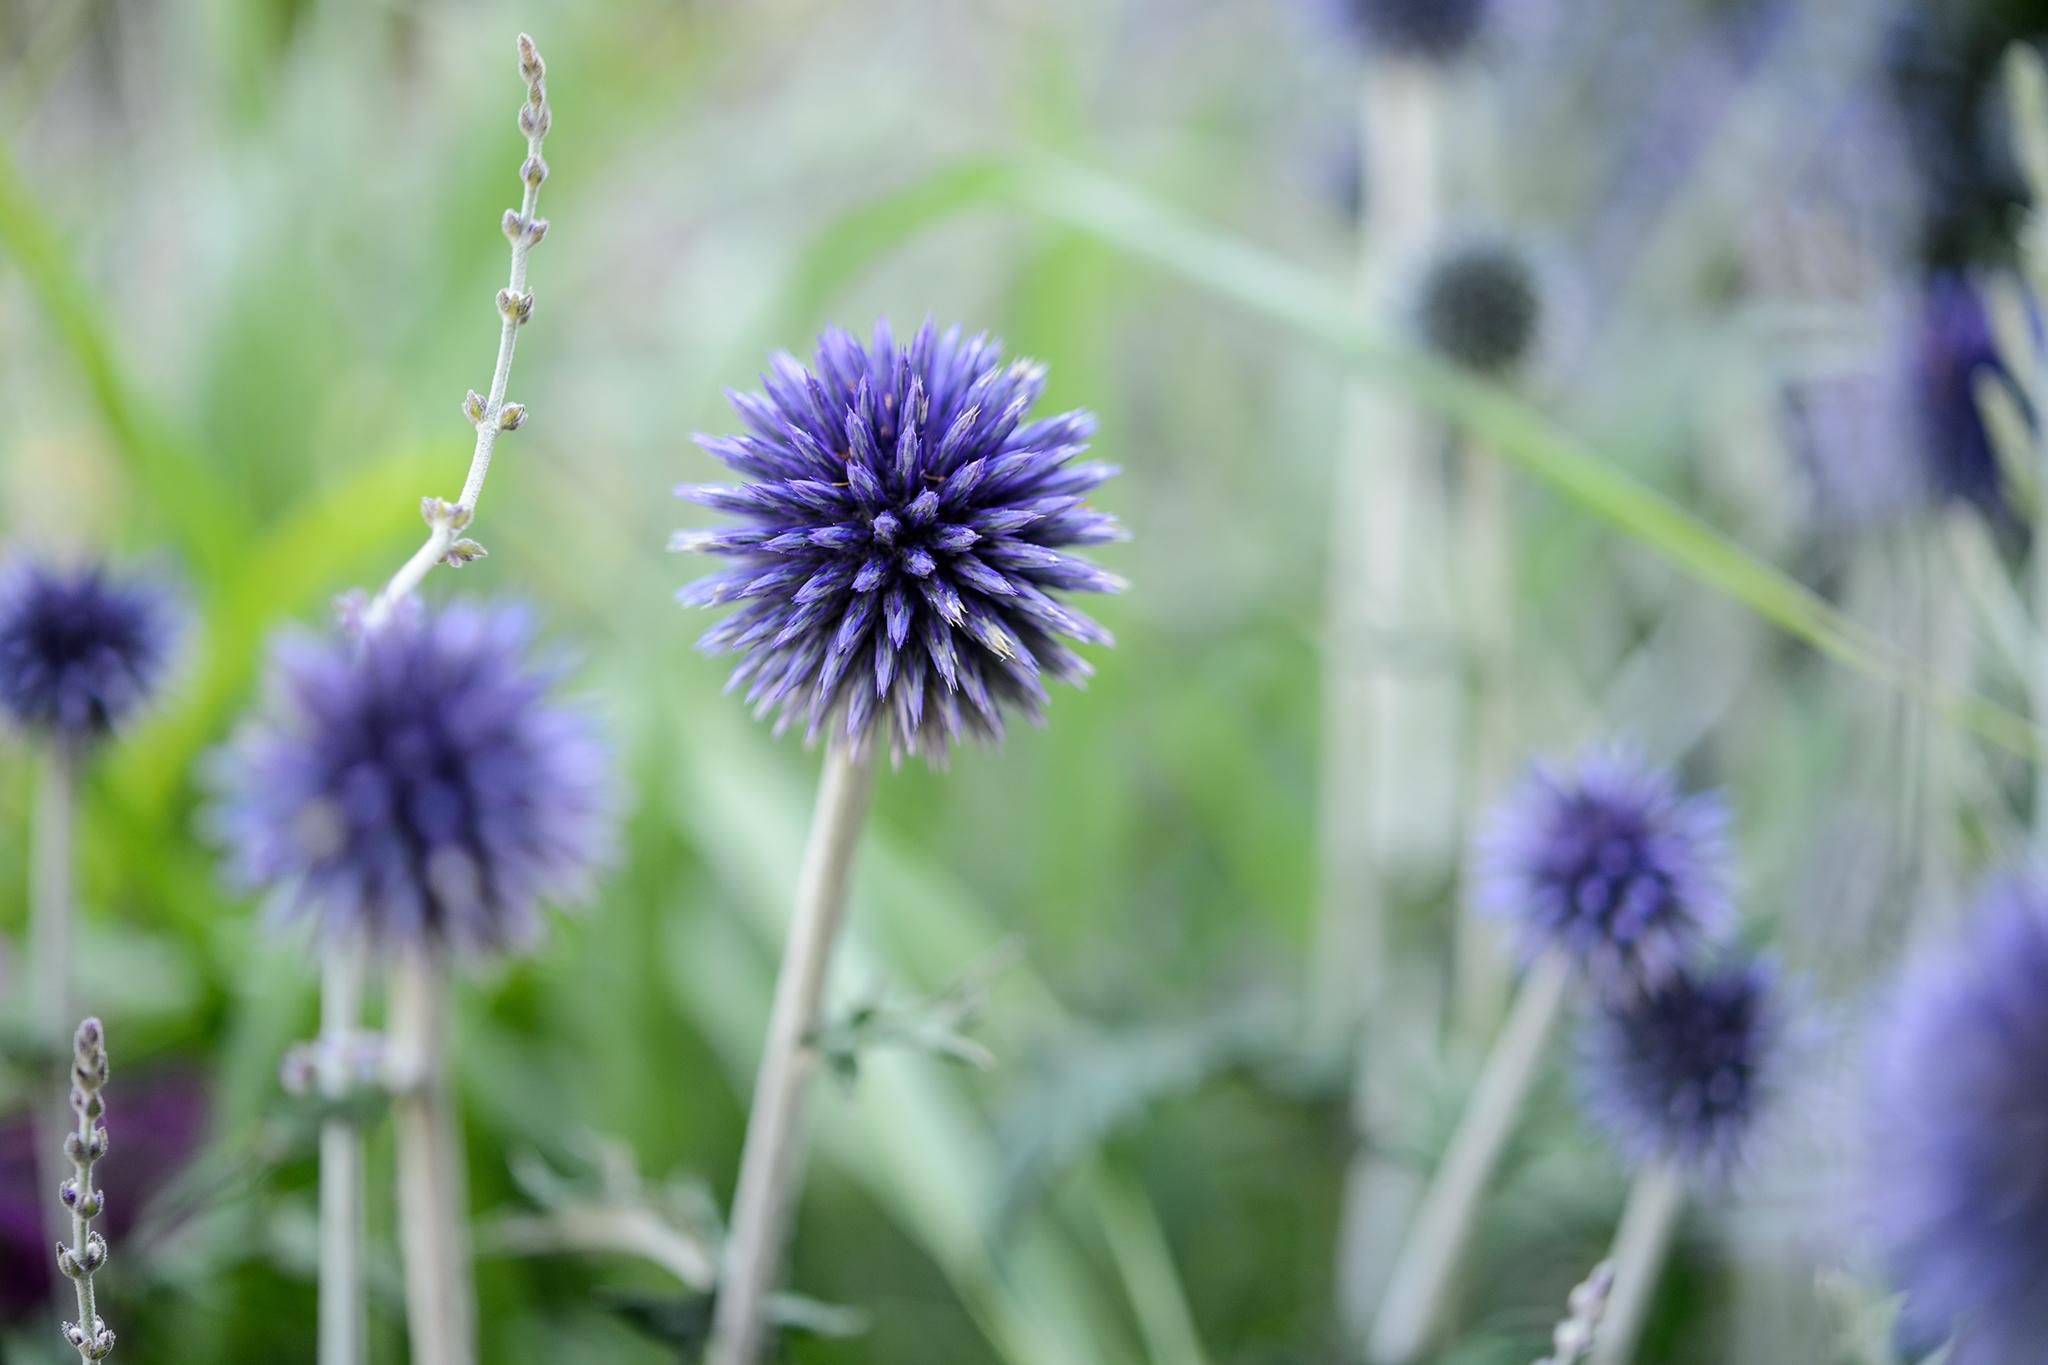 flowers-to-pick-in-august-globe-thistle-echinops-ritro-2